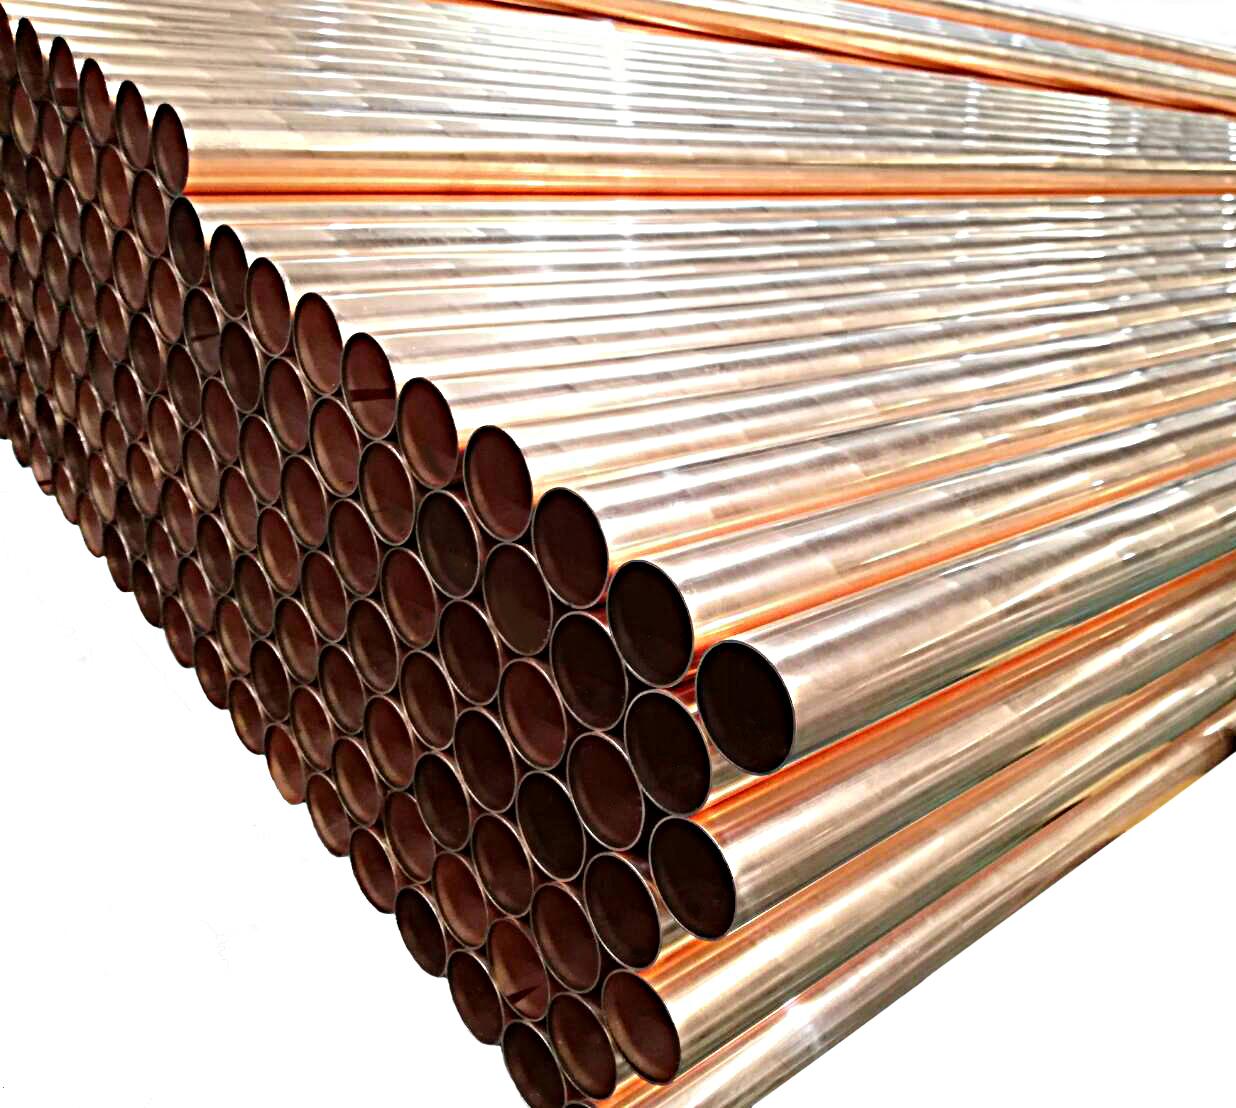 Furukawa Metal (Thailand) Public Company Limited - Accumulator Tube